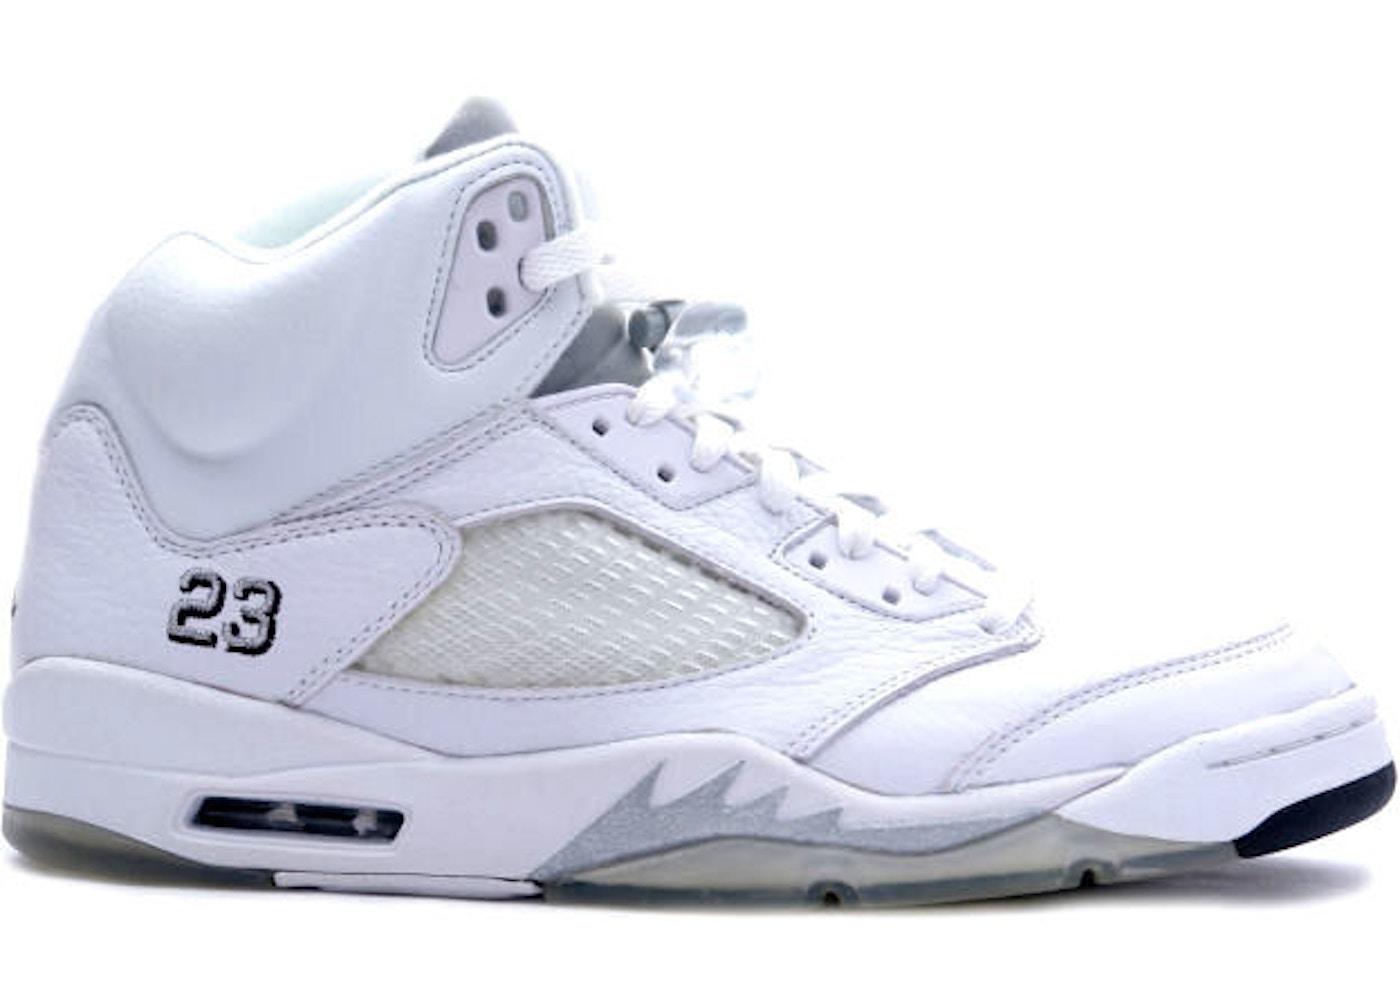 half off d9e9f 9d7e6 Jordan 5 Retro Metallic White (2000)